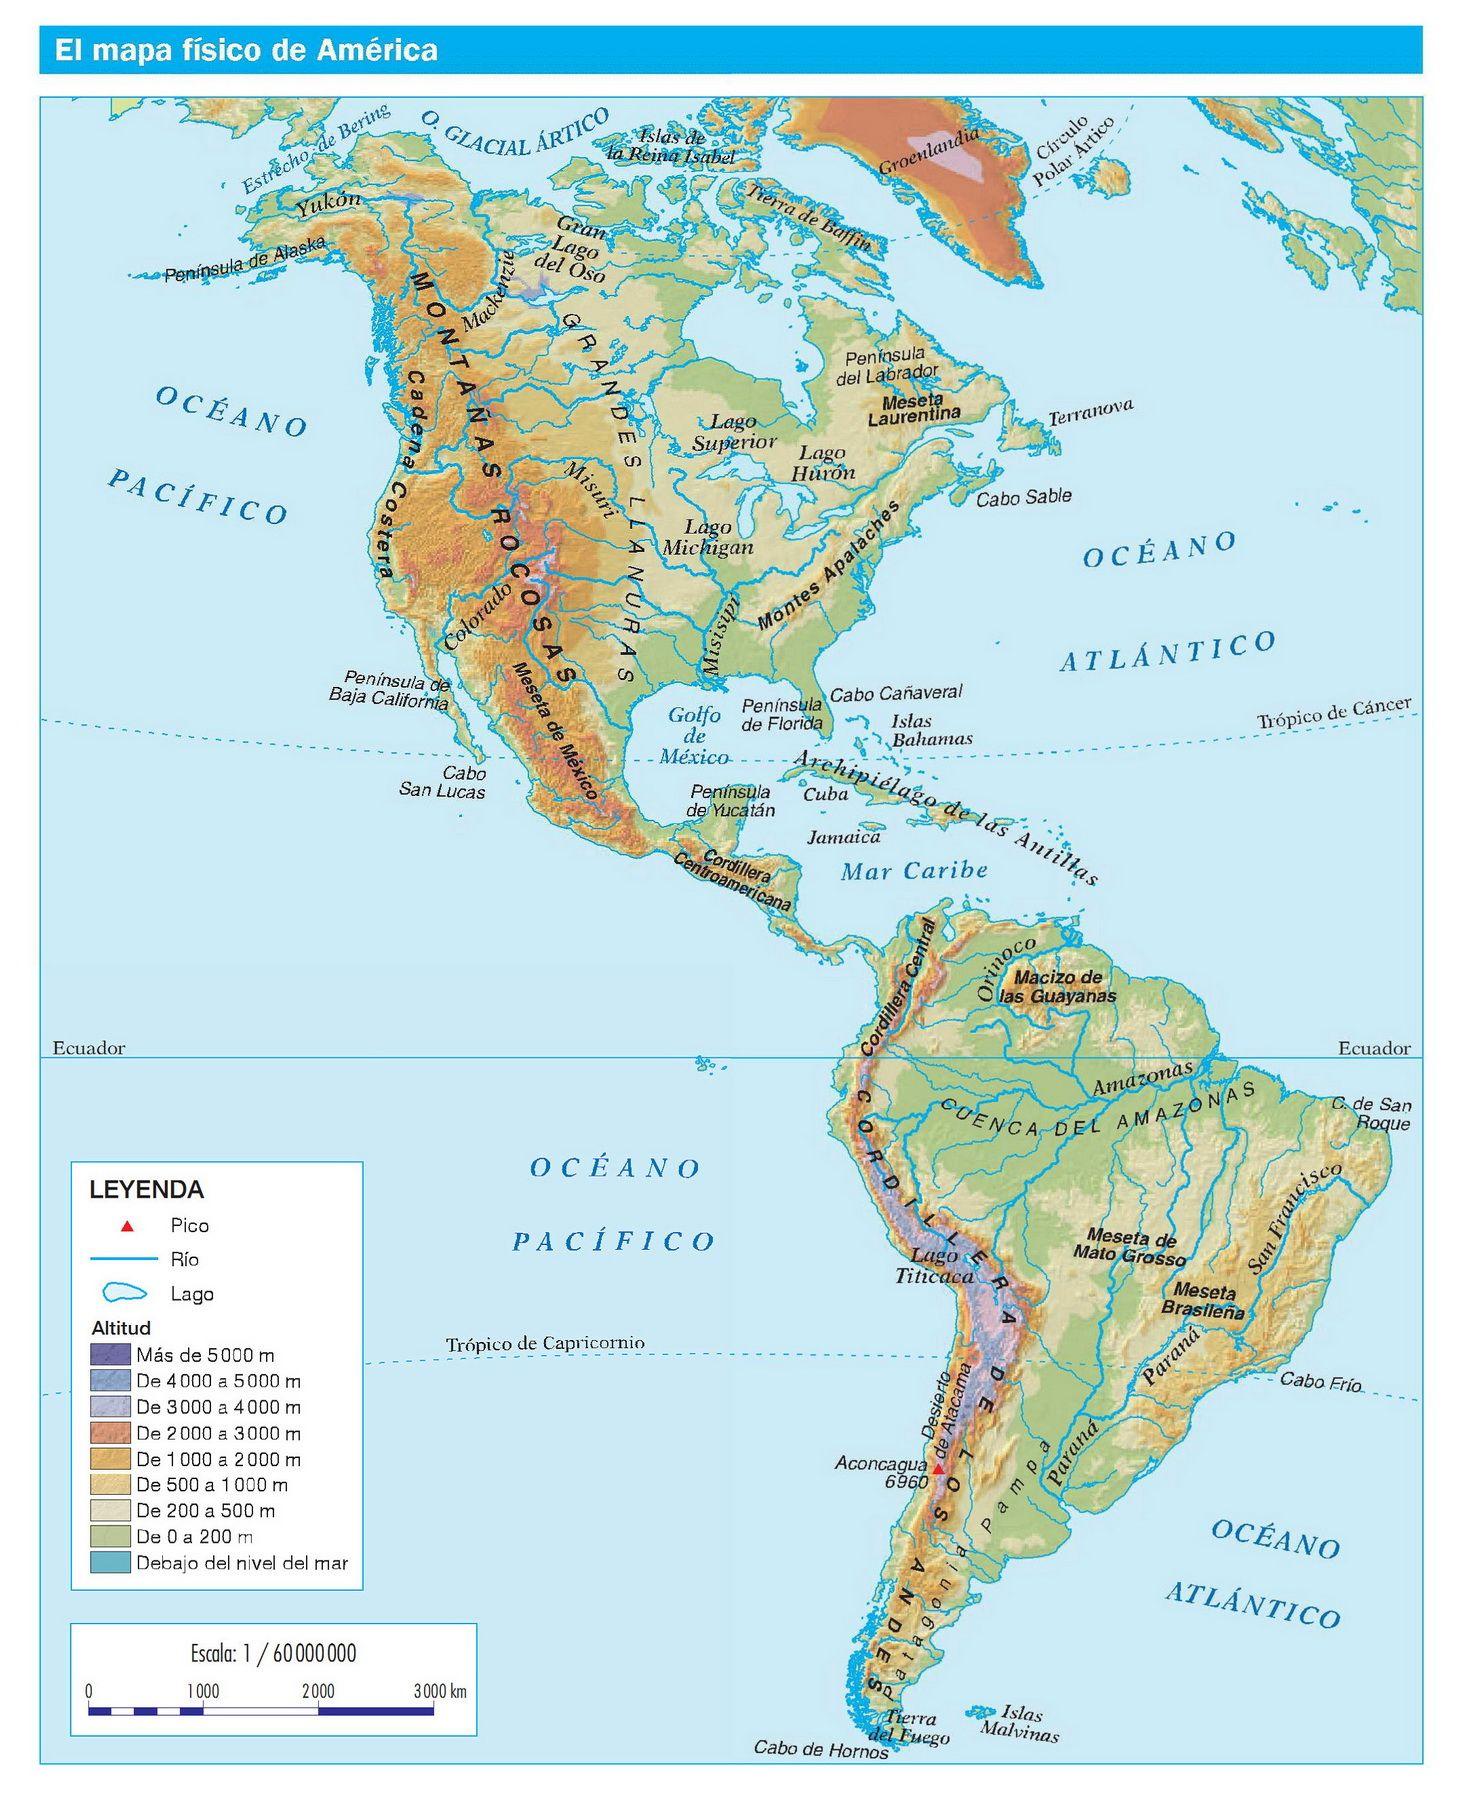 América Mapa Físico 1460 1800px Mapa Fisico Mapa De America Imágenes De Mapas